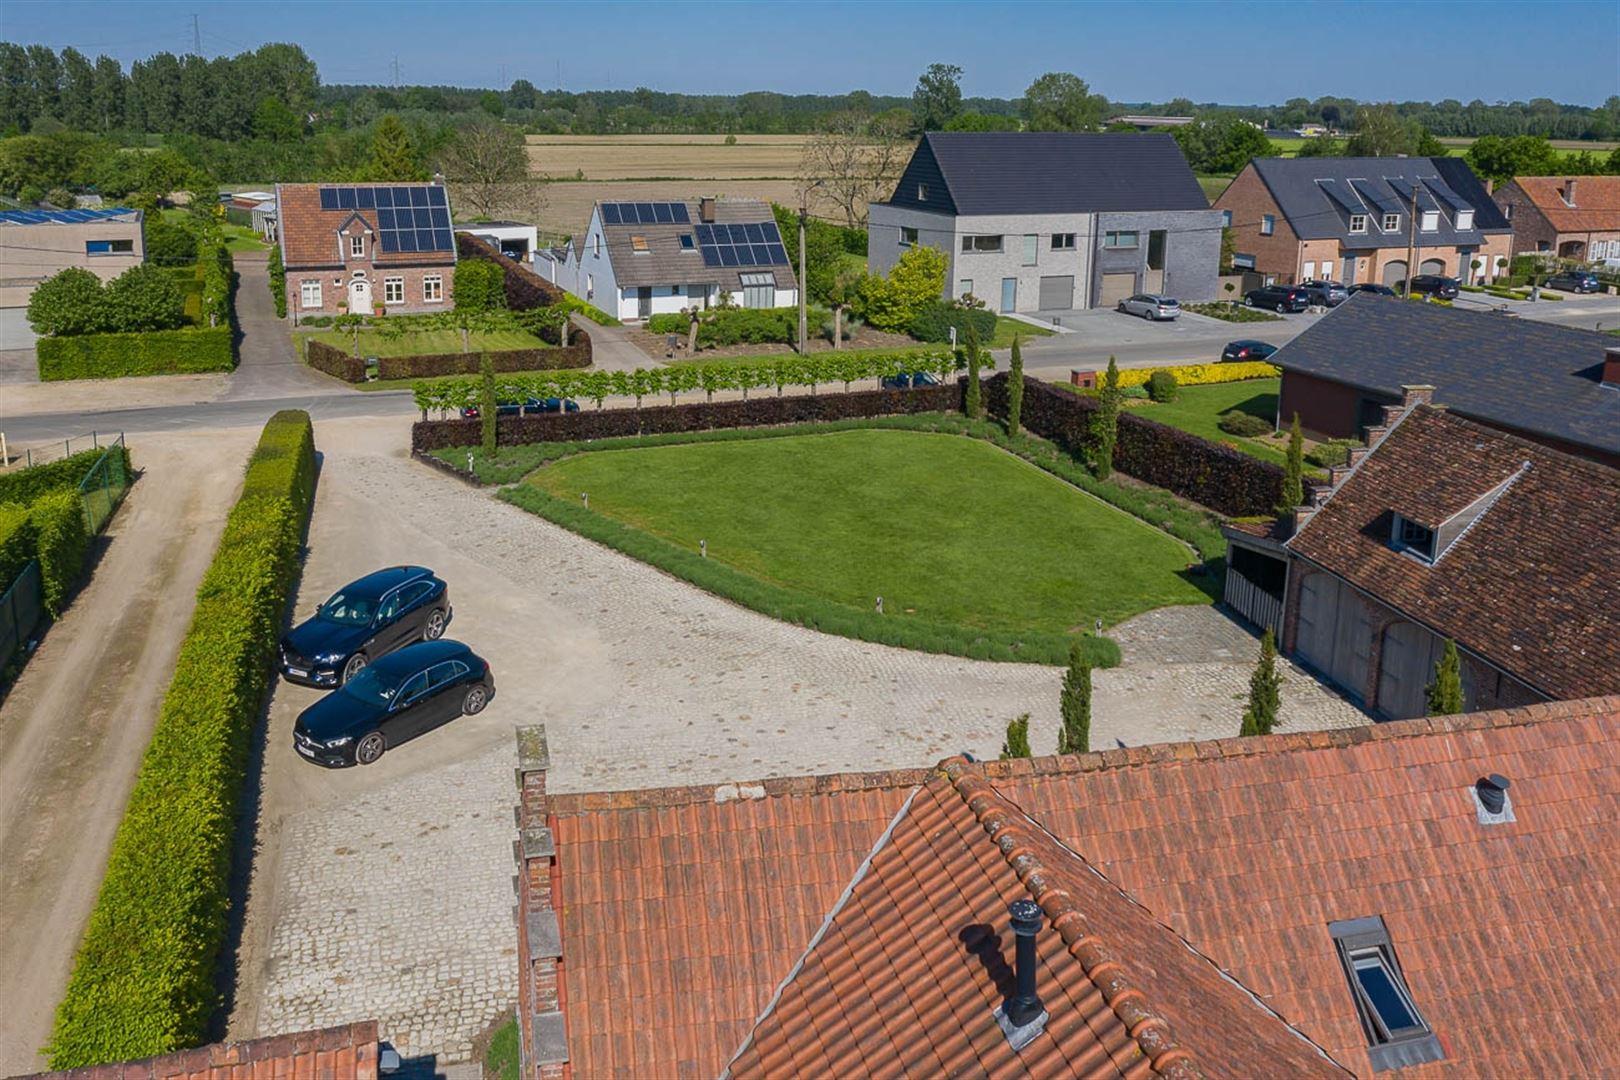 Foto 11 : Handelspand te 9160 LOKEREN (België) - Prijs € 1.400.000